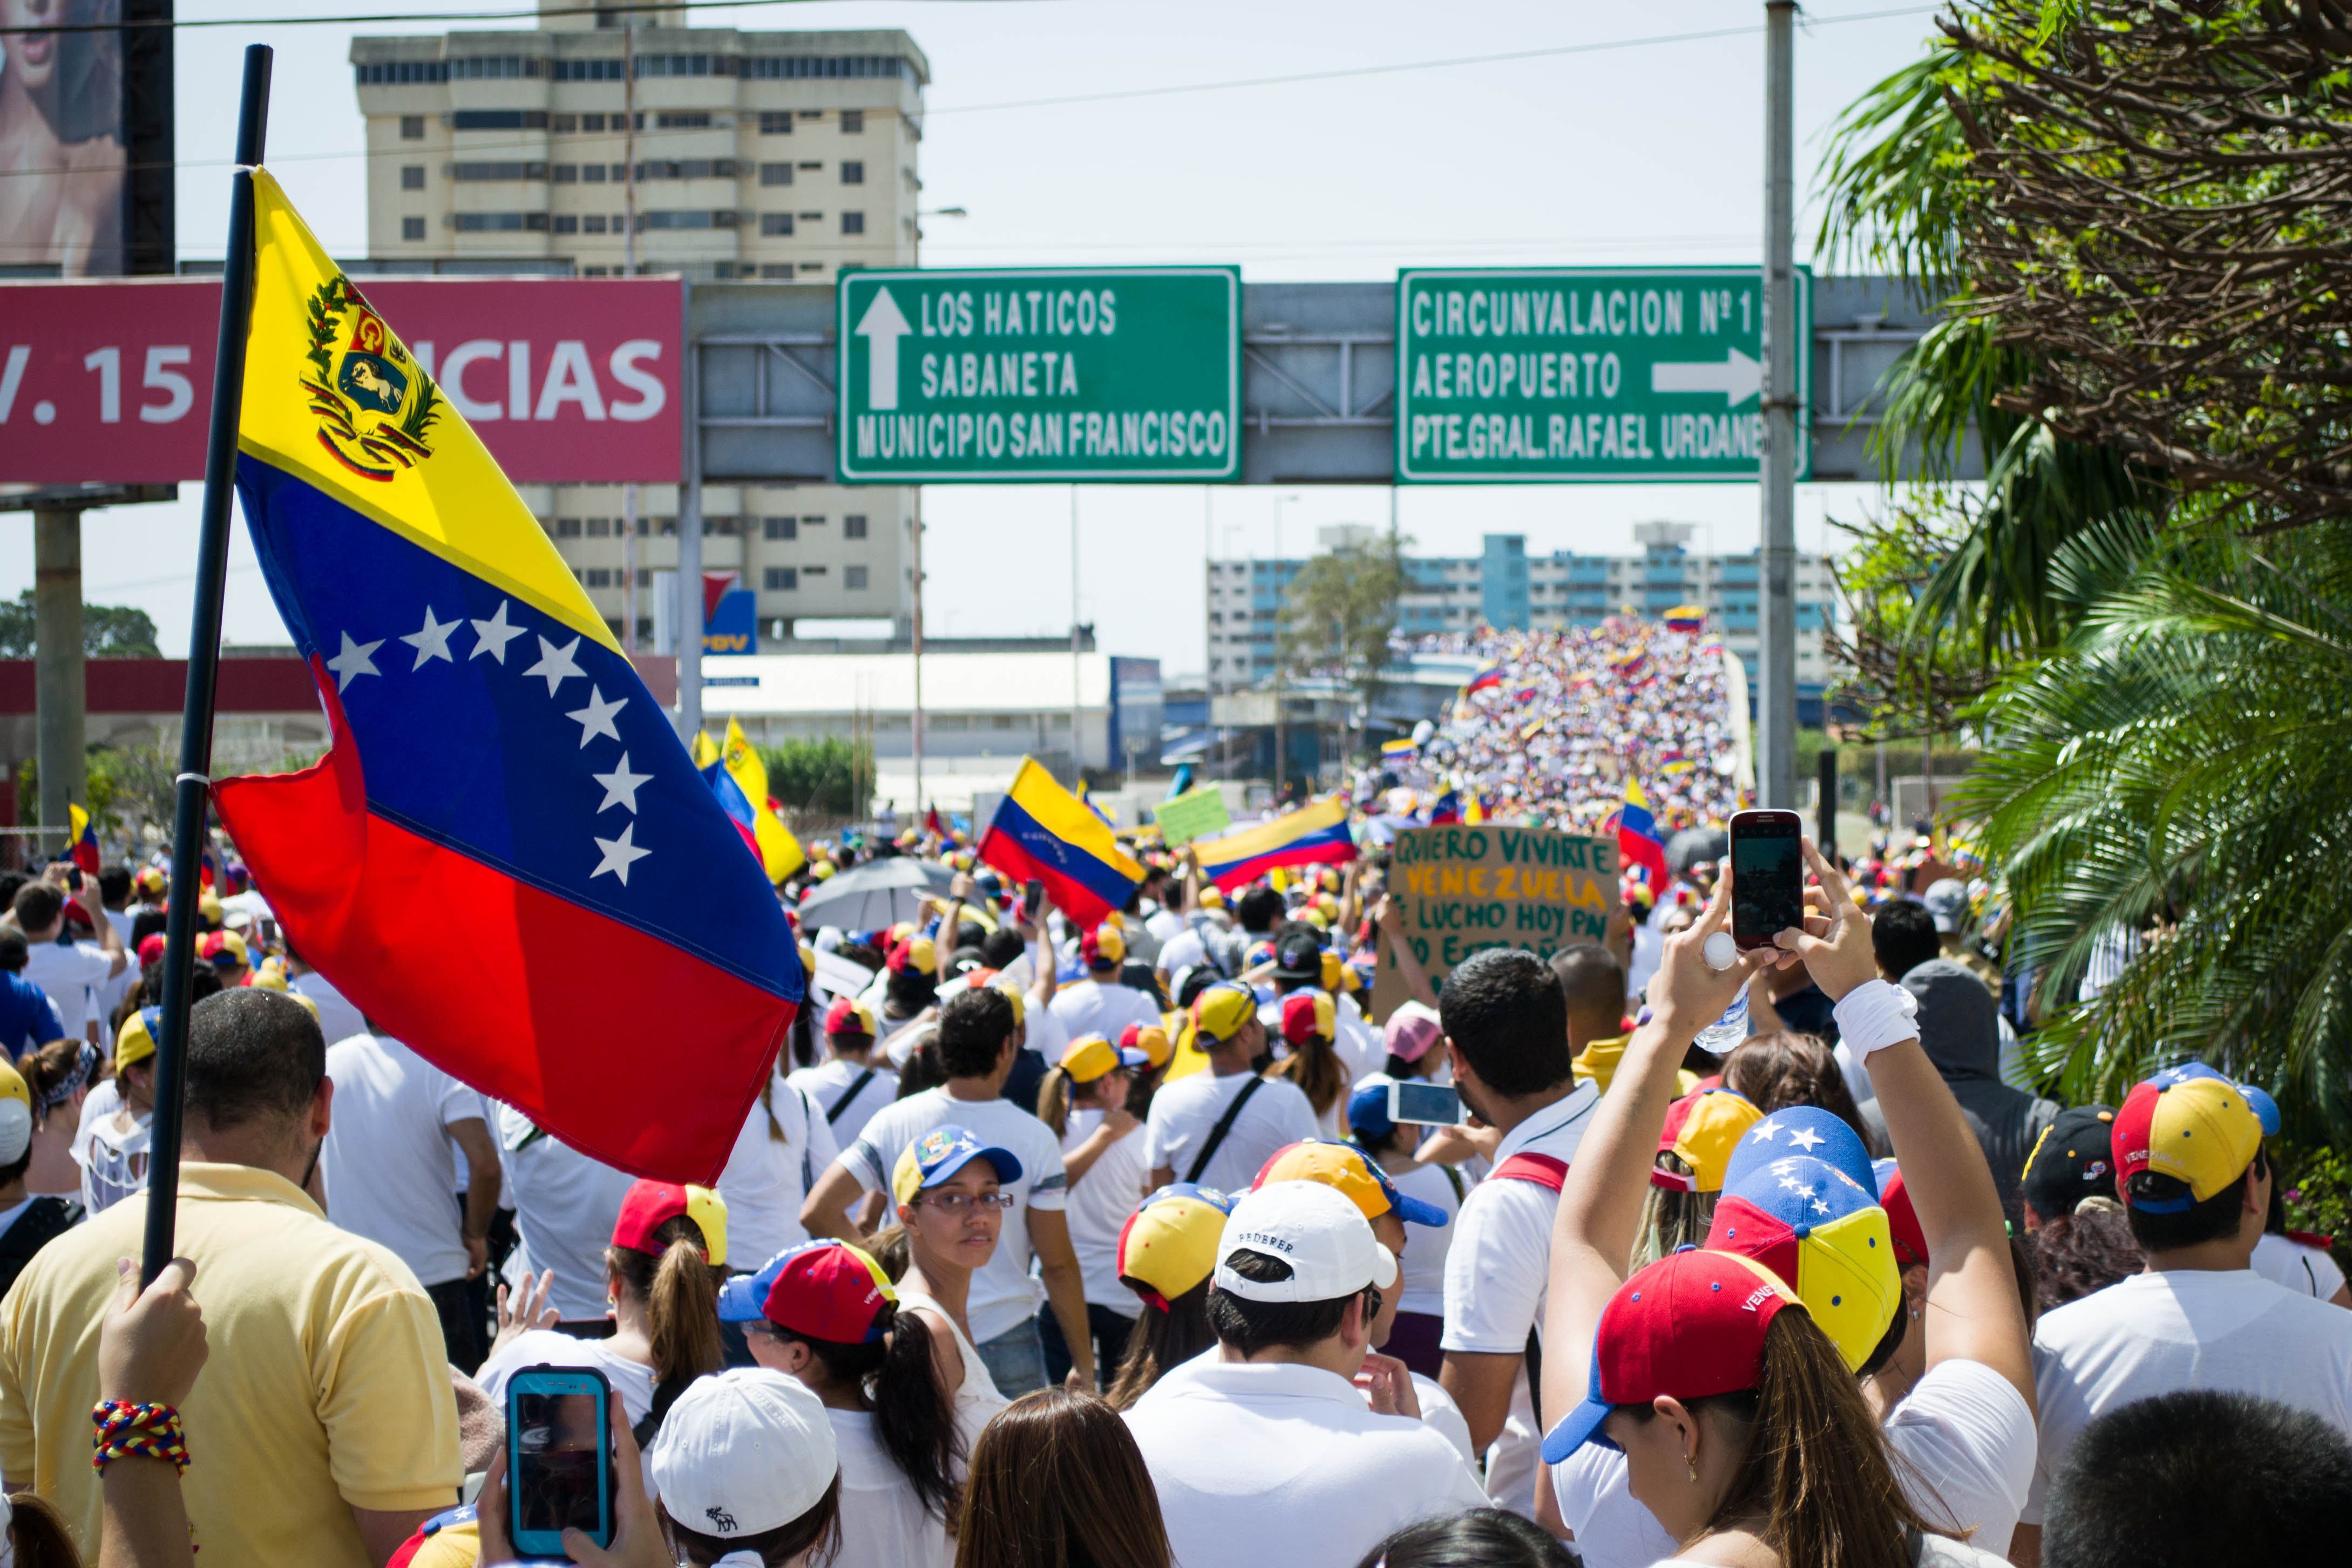 Ponovno nestašica struje u Venezueli